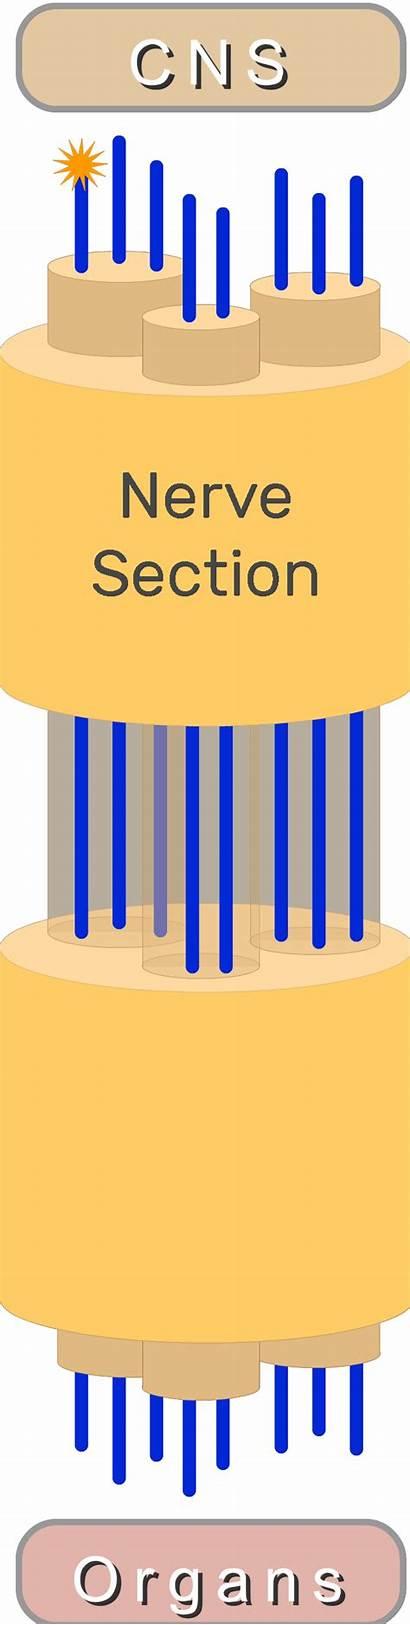 Organs Nervous System Motor Major Cns Peripheral